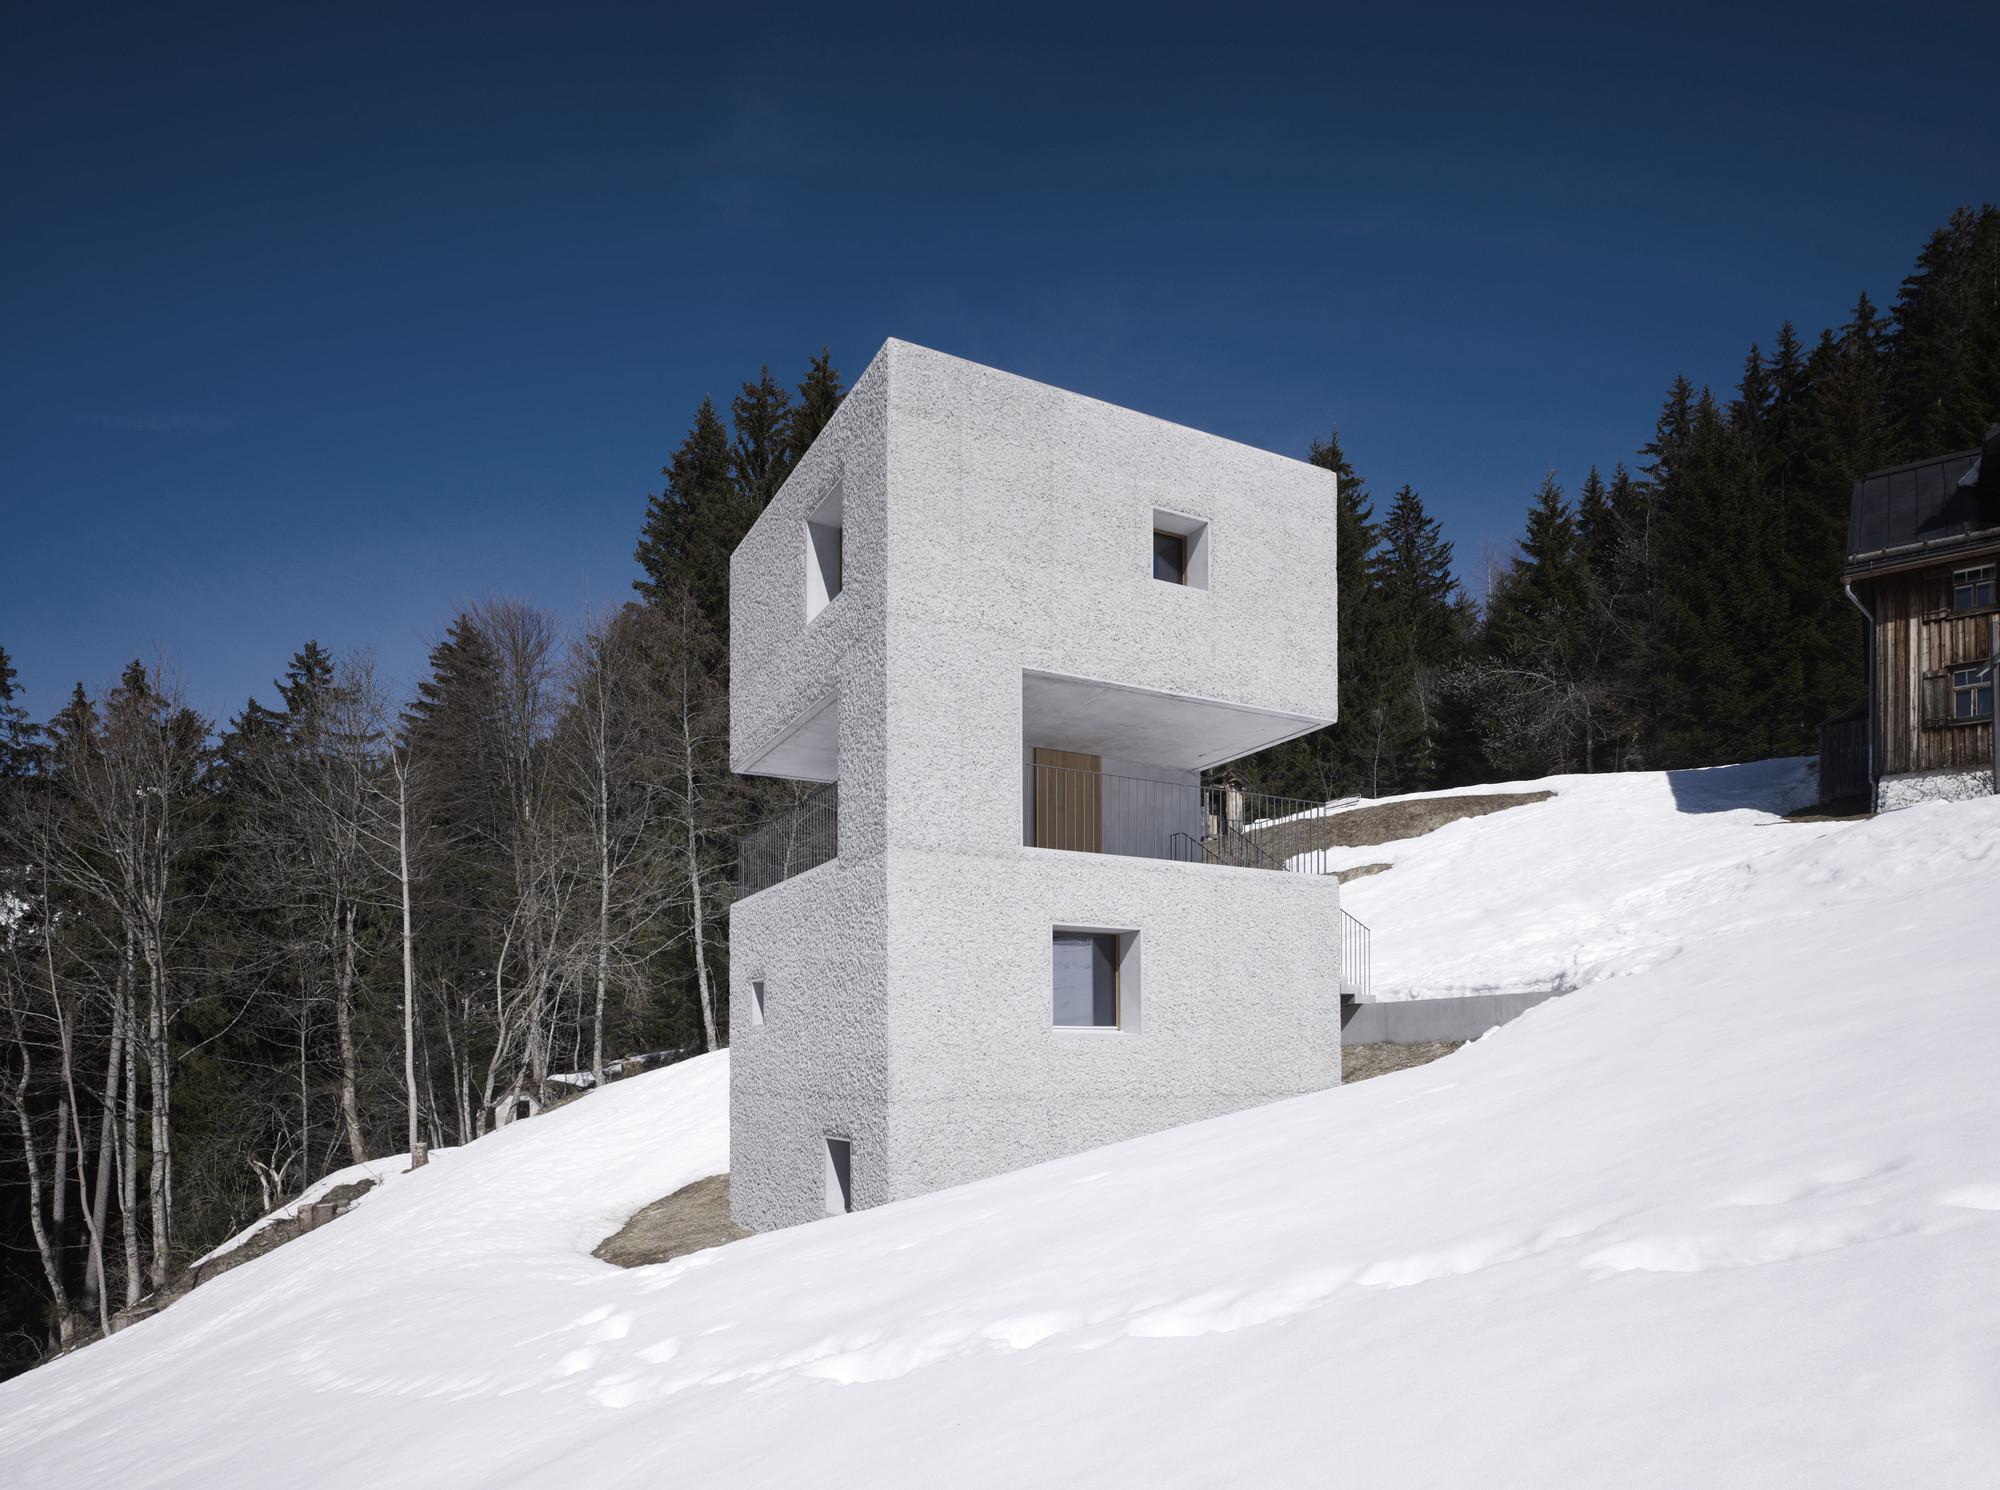 mountain cabin marte marte architekten archdaily. Black Bedroom Furniture Sets. Home Design Ideas